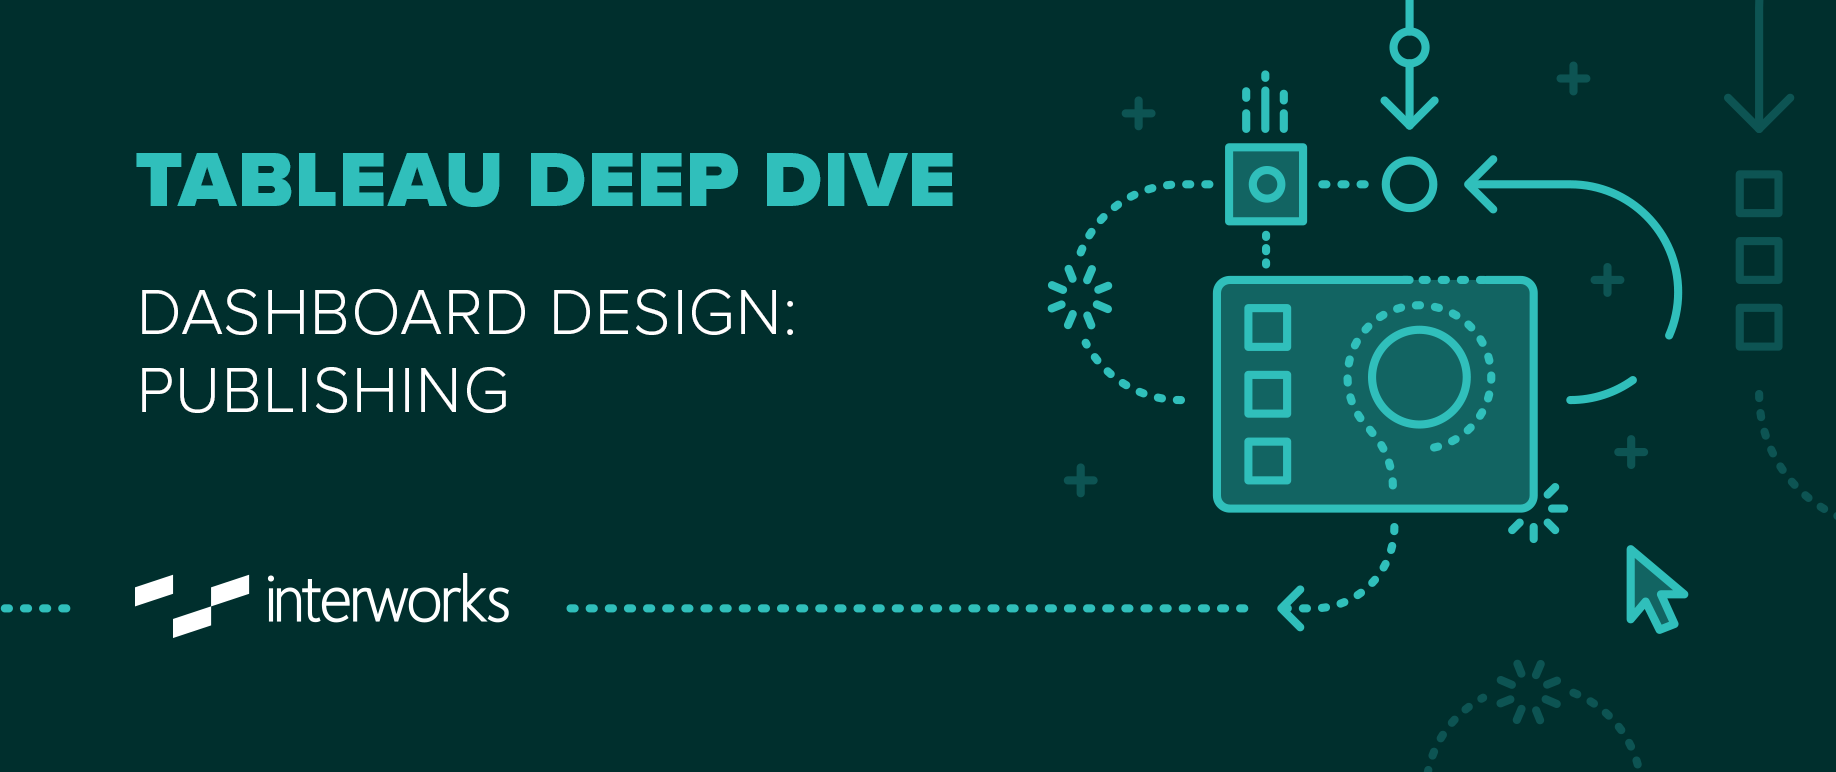 Tableau Deep Dive: Dashboard Design - Publishing | InterWorks